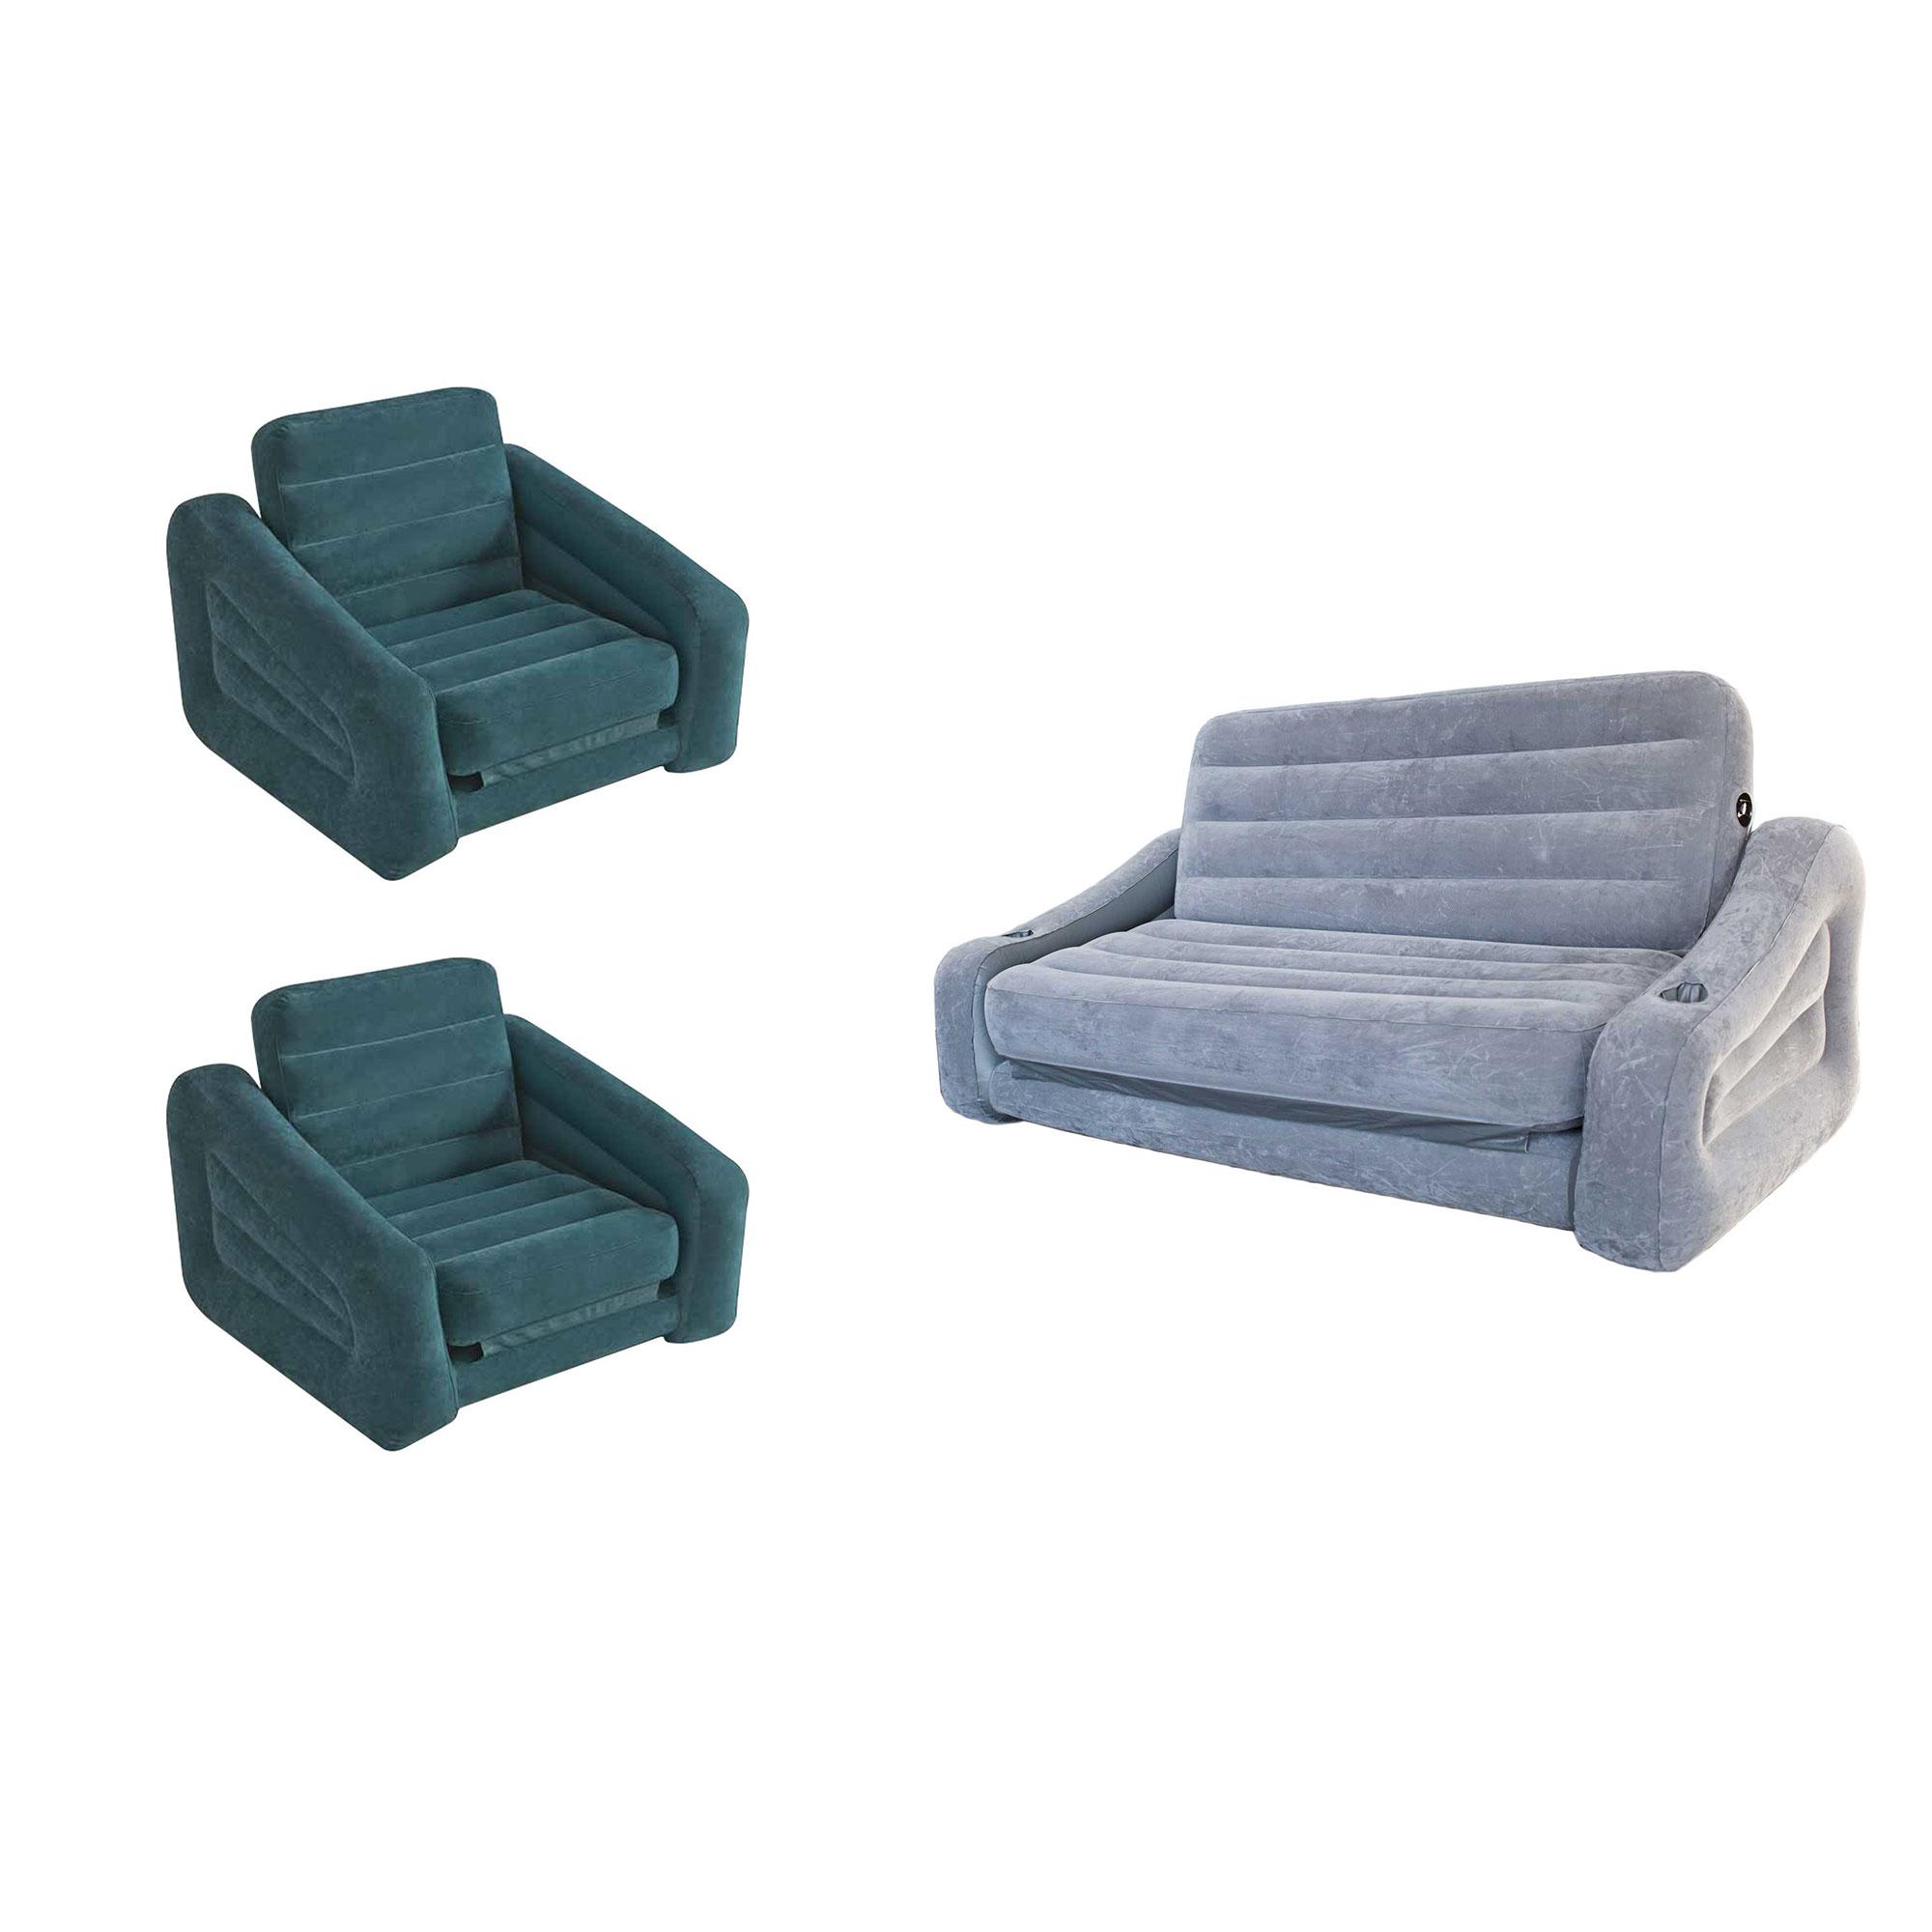 Intex inflatable pull out sofa queen air mattress chair bed sleeper 2 pack